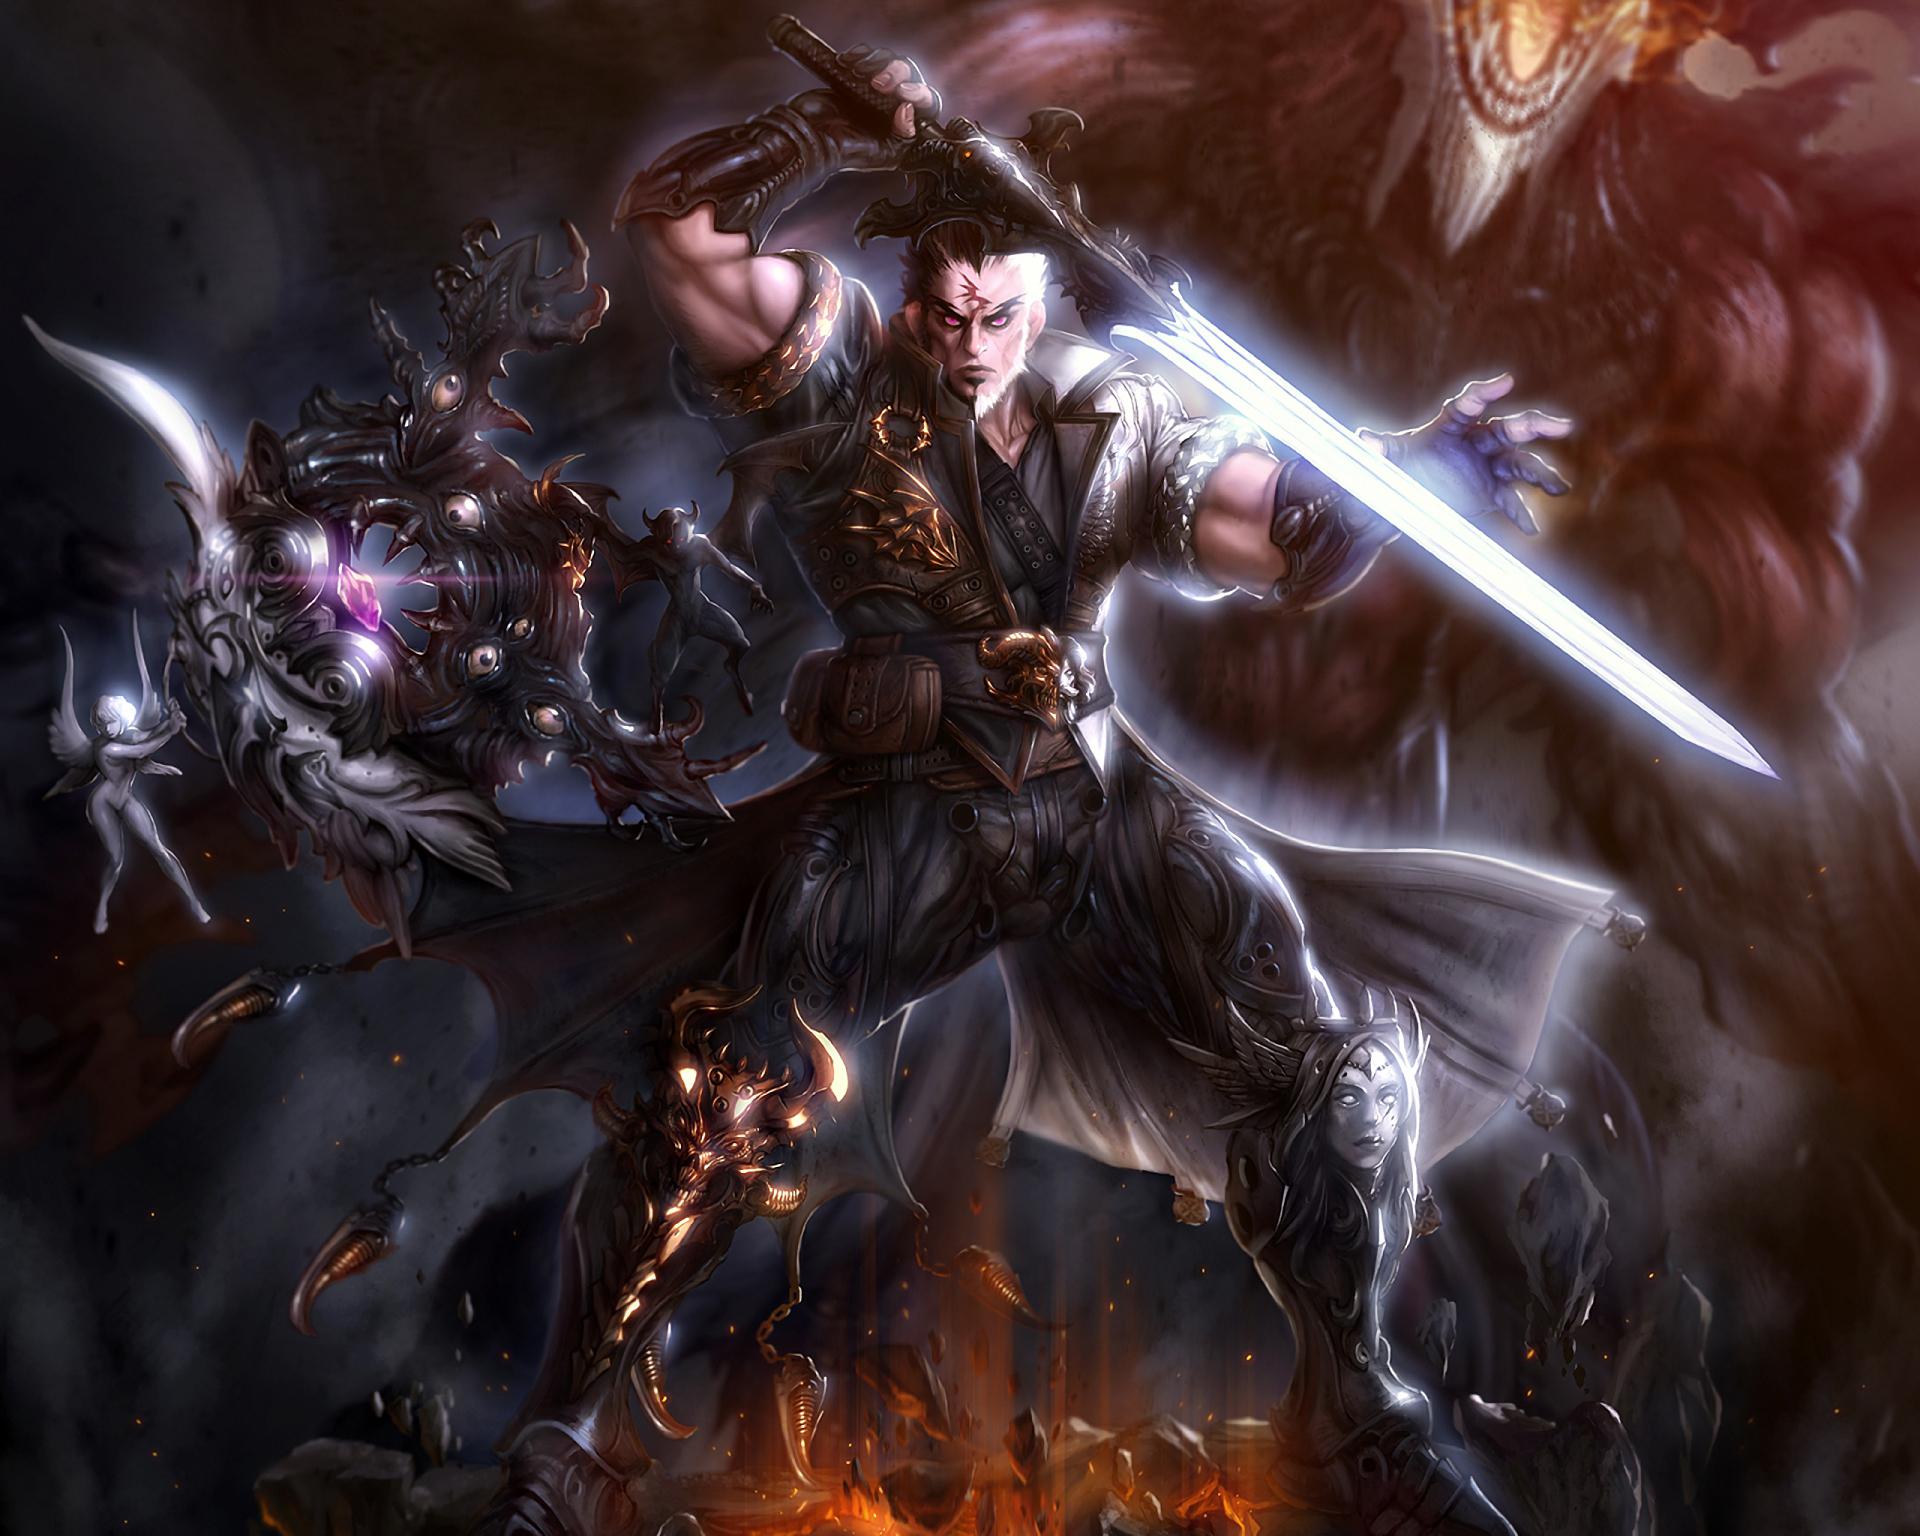 warrior angel demon crystal armor sword fire warriors wallpaper    Angel Warriors Vs Demons